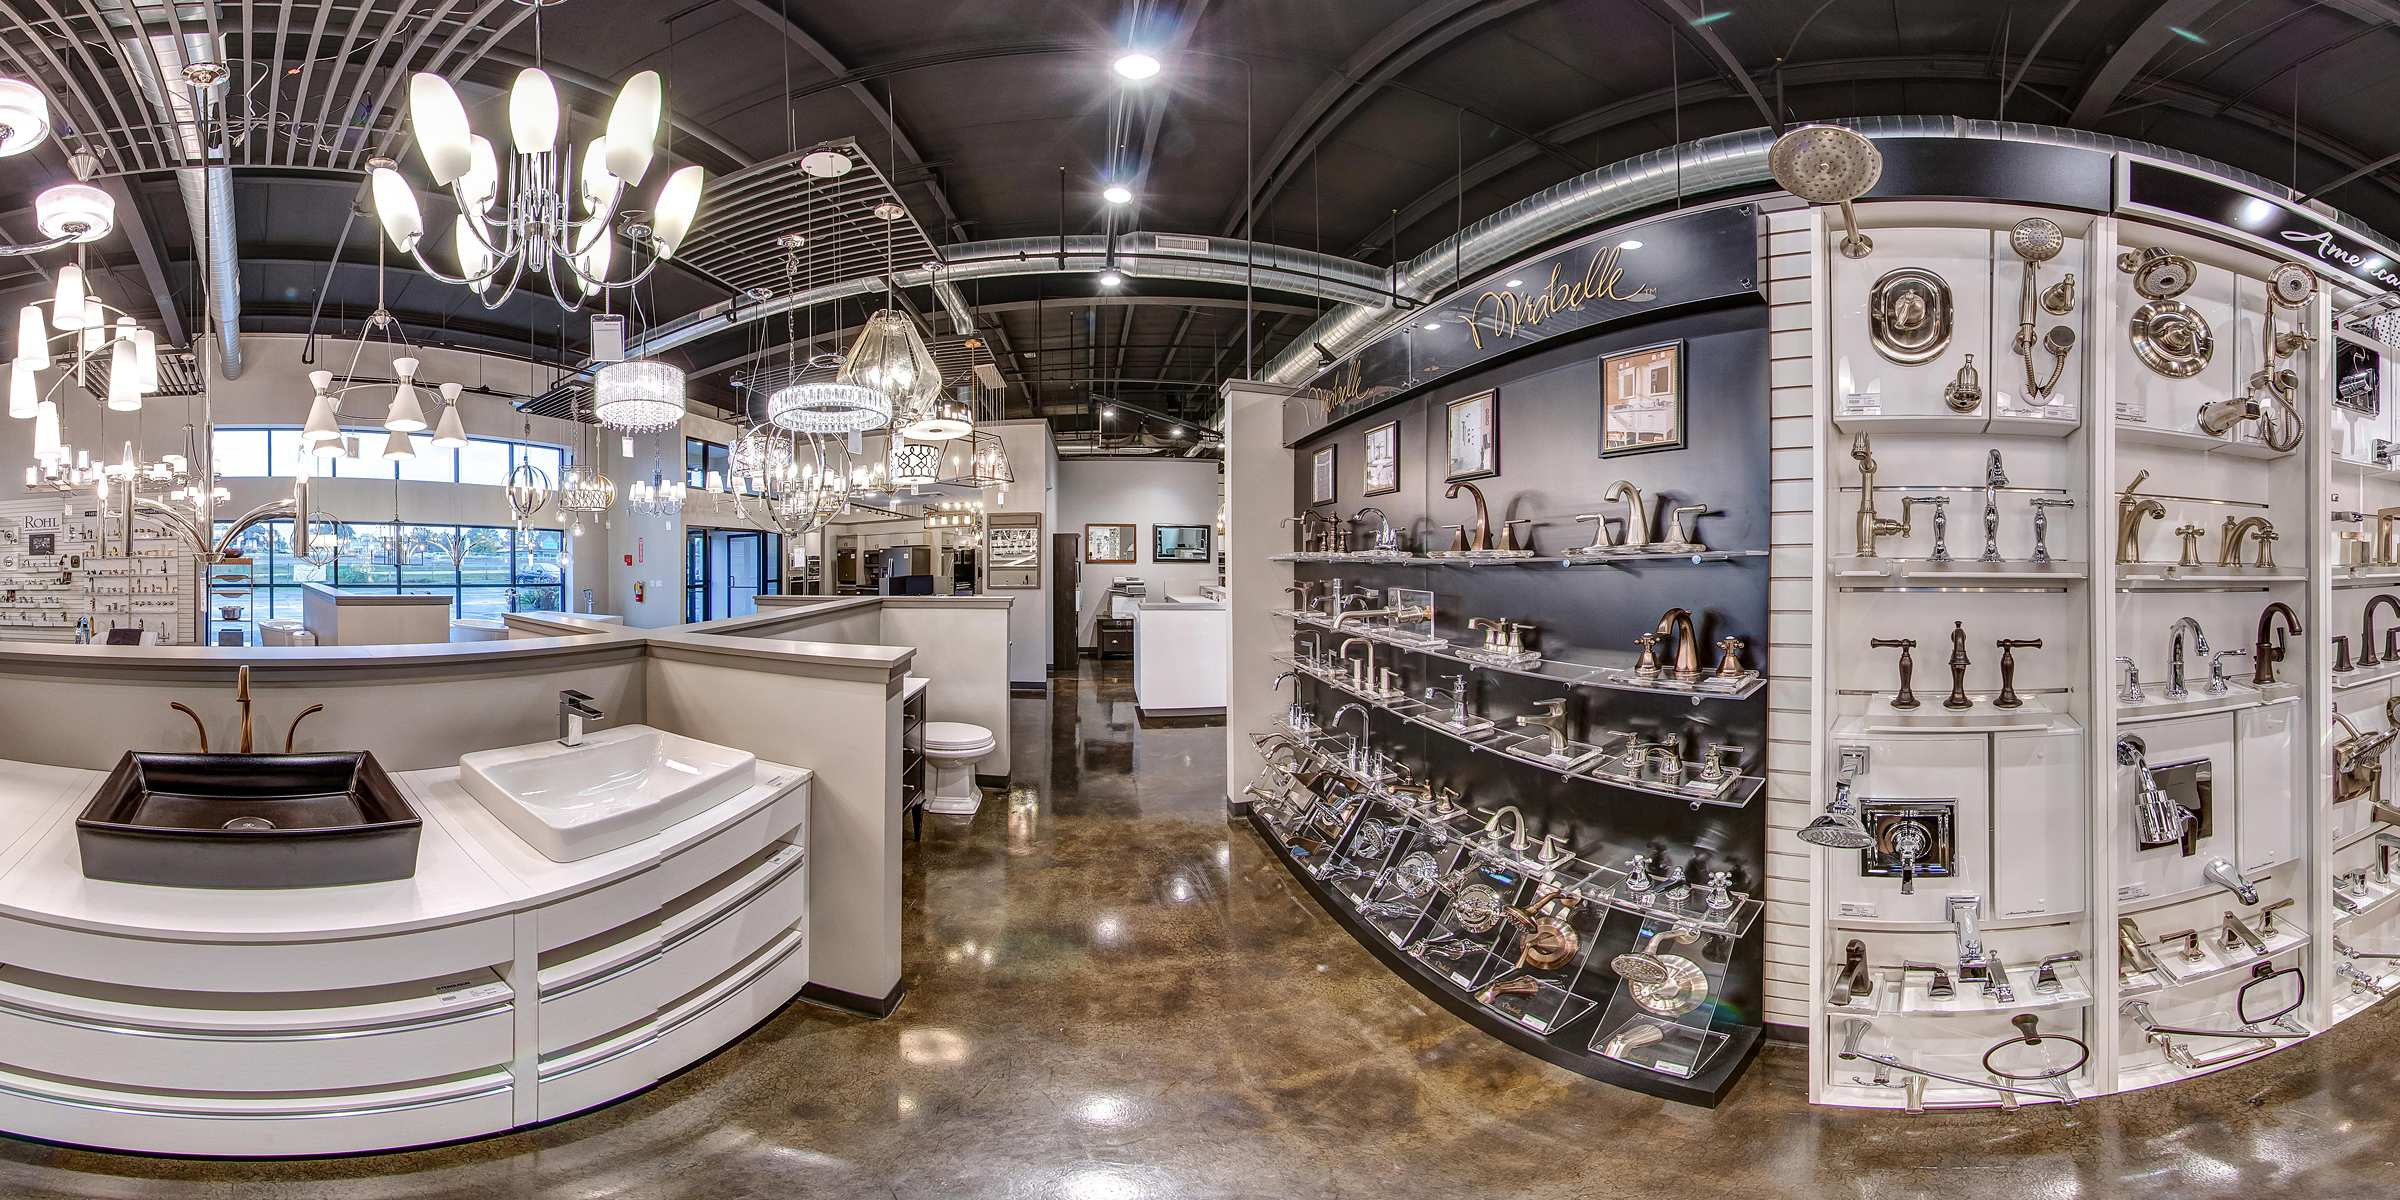 ferguson bath kitchen and lighting gallery oceanfur23 com rh oceanfur23 com